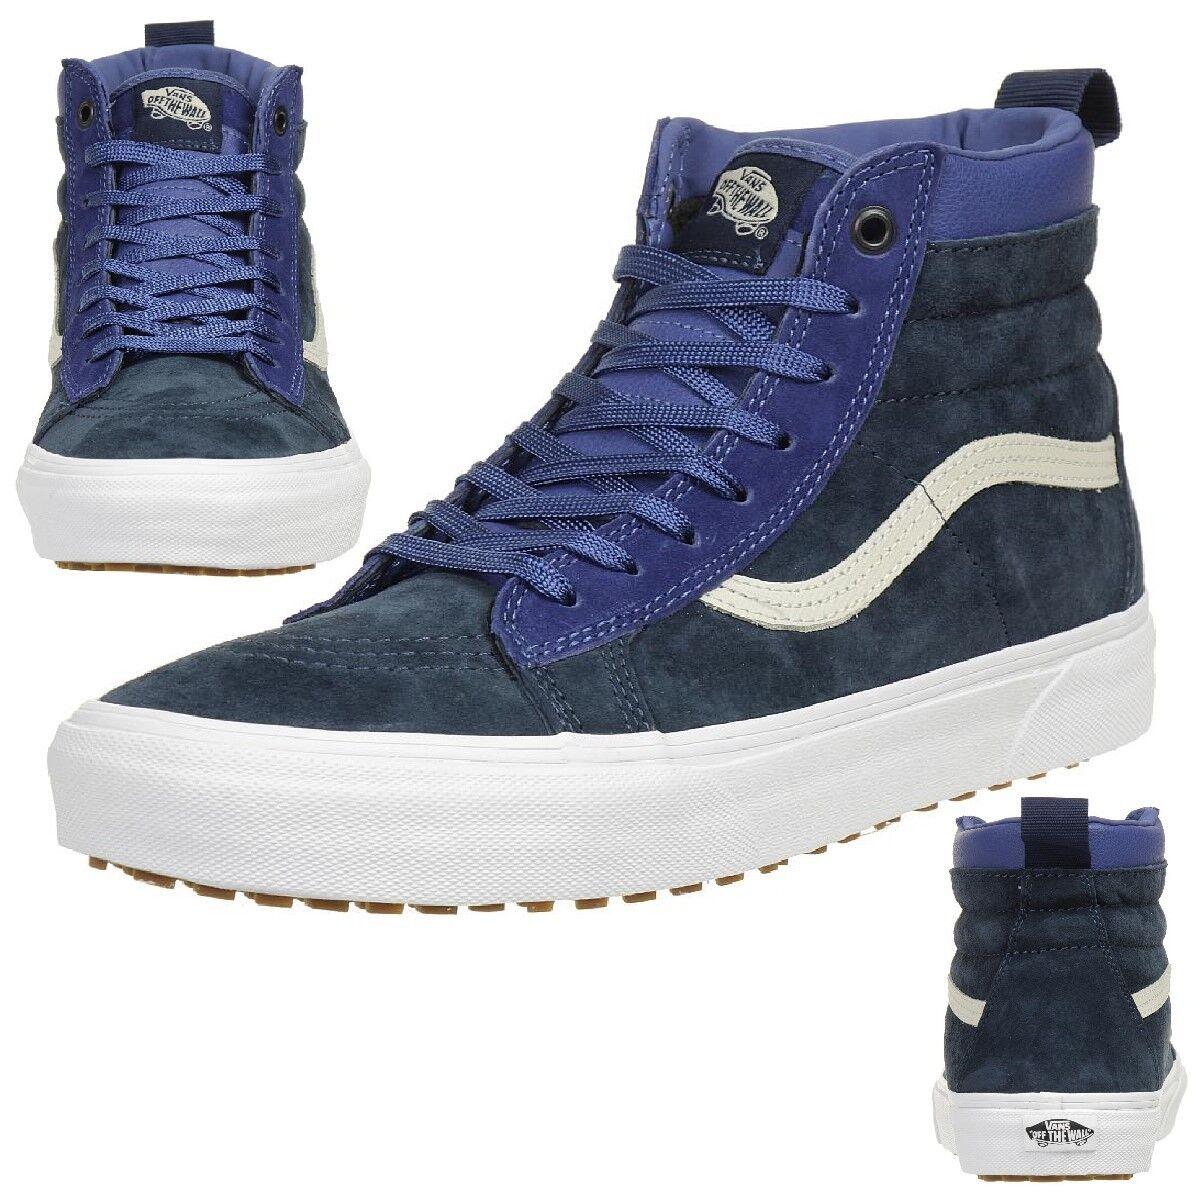 VANS Classic SK8-HI MTE Winter Turnschuhe Schuhe Leder VA33TXQWY blau